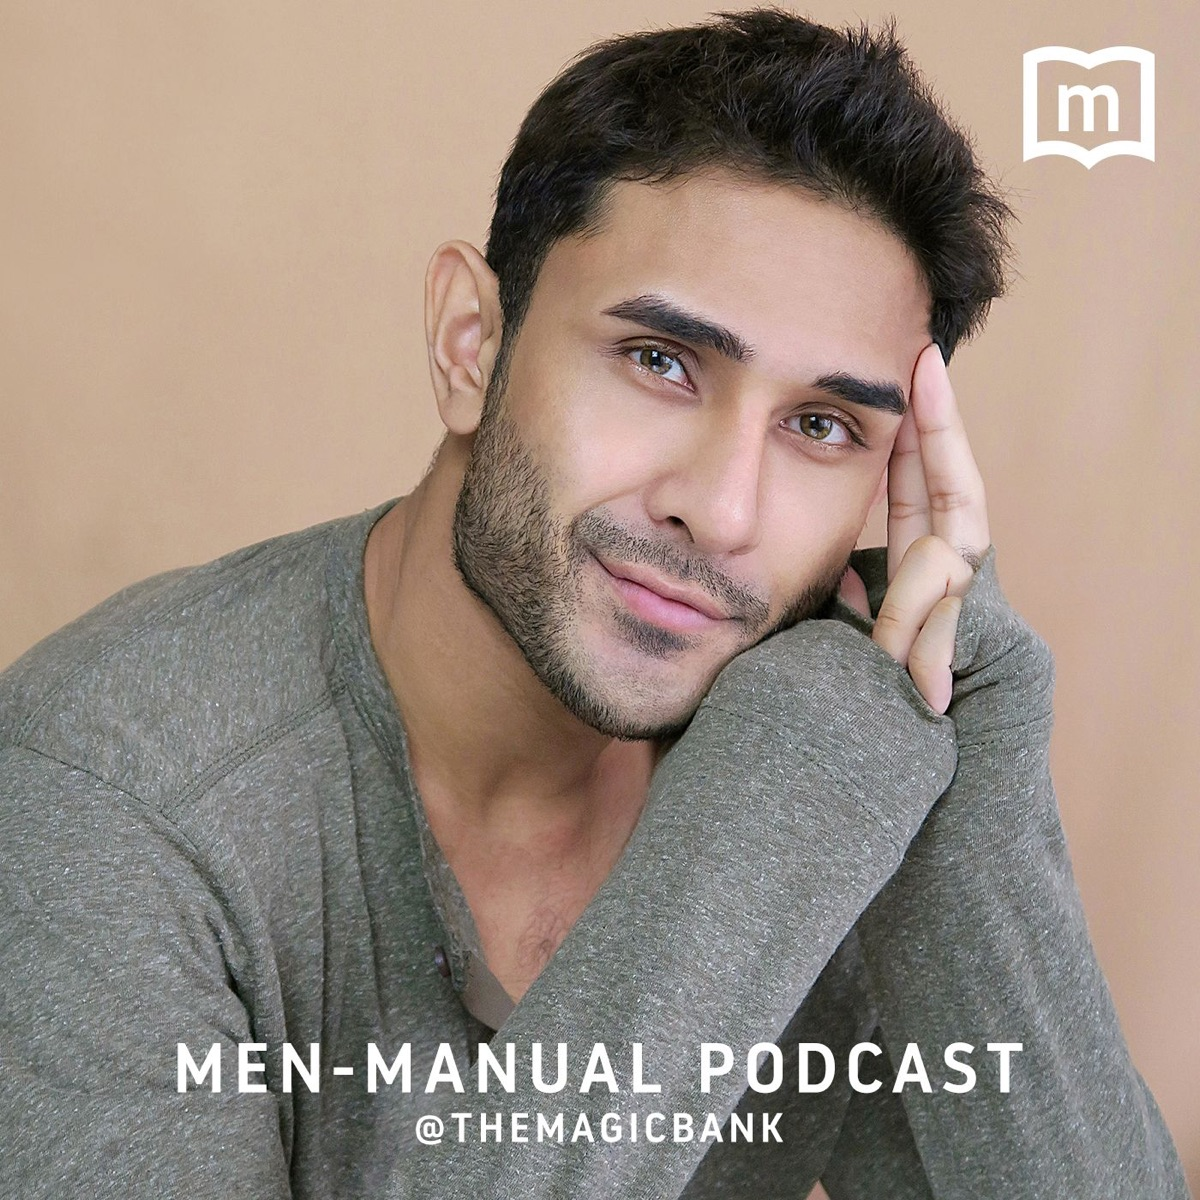 men-manual podcast